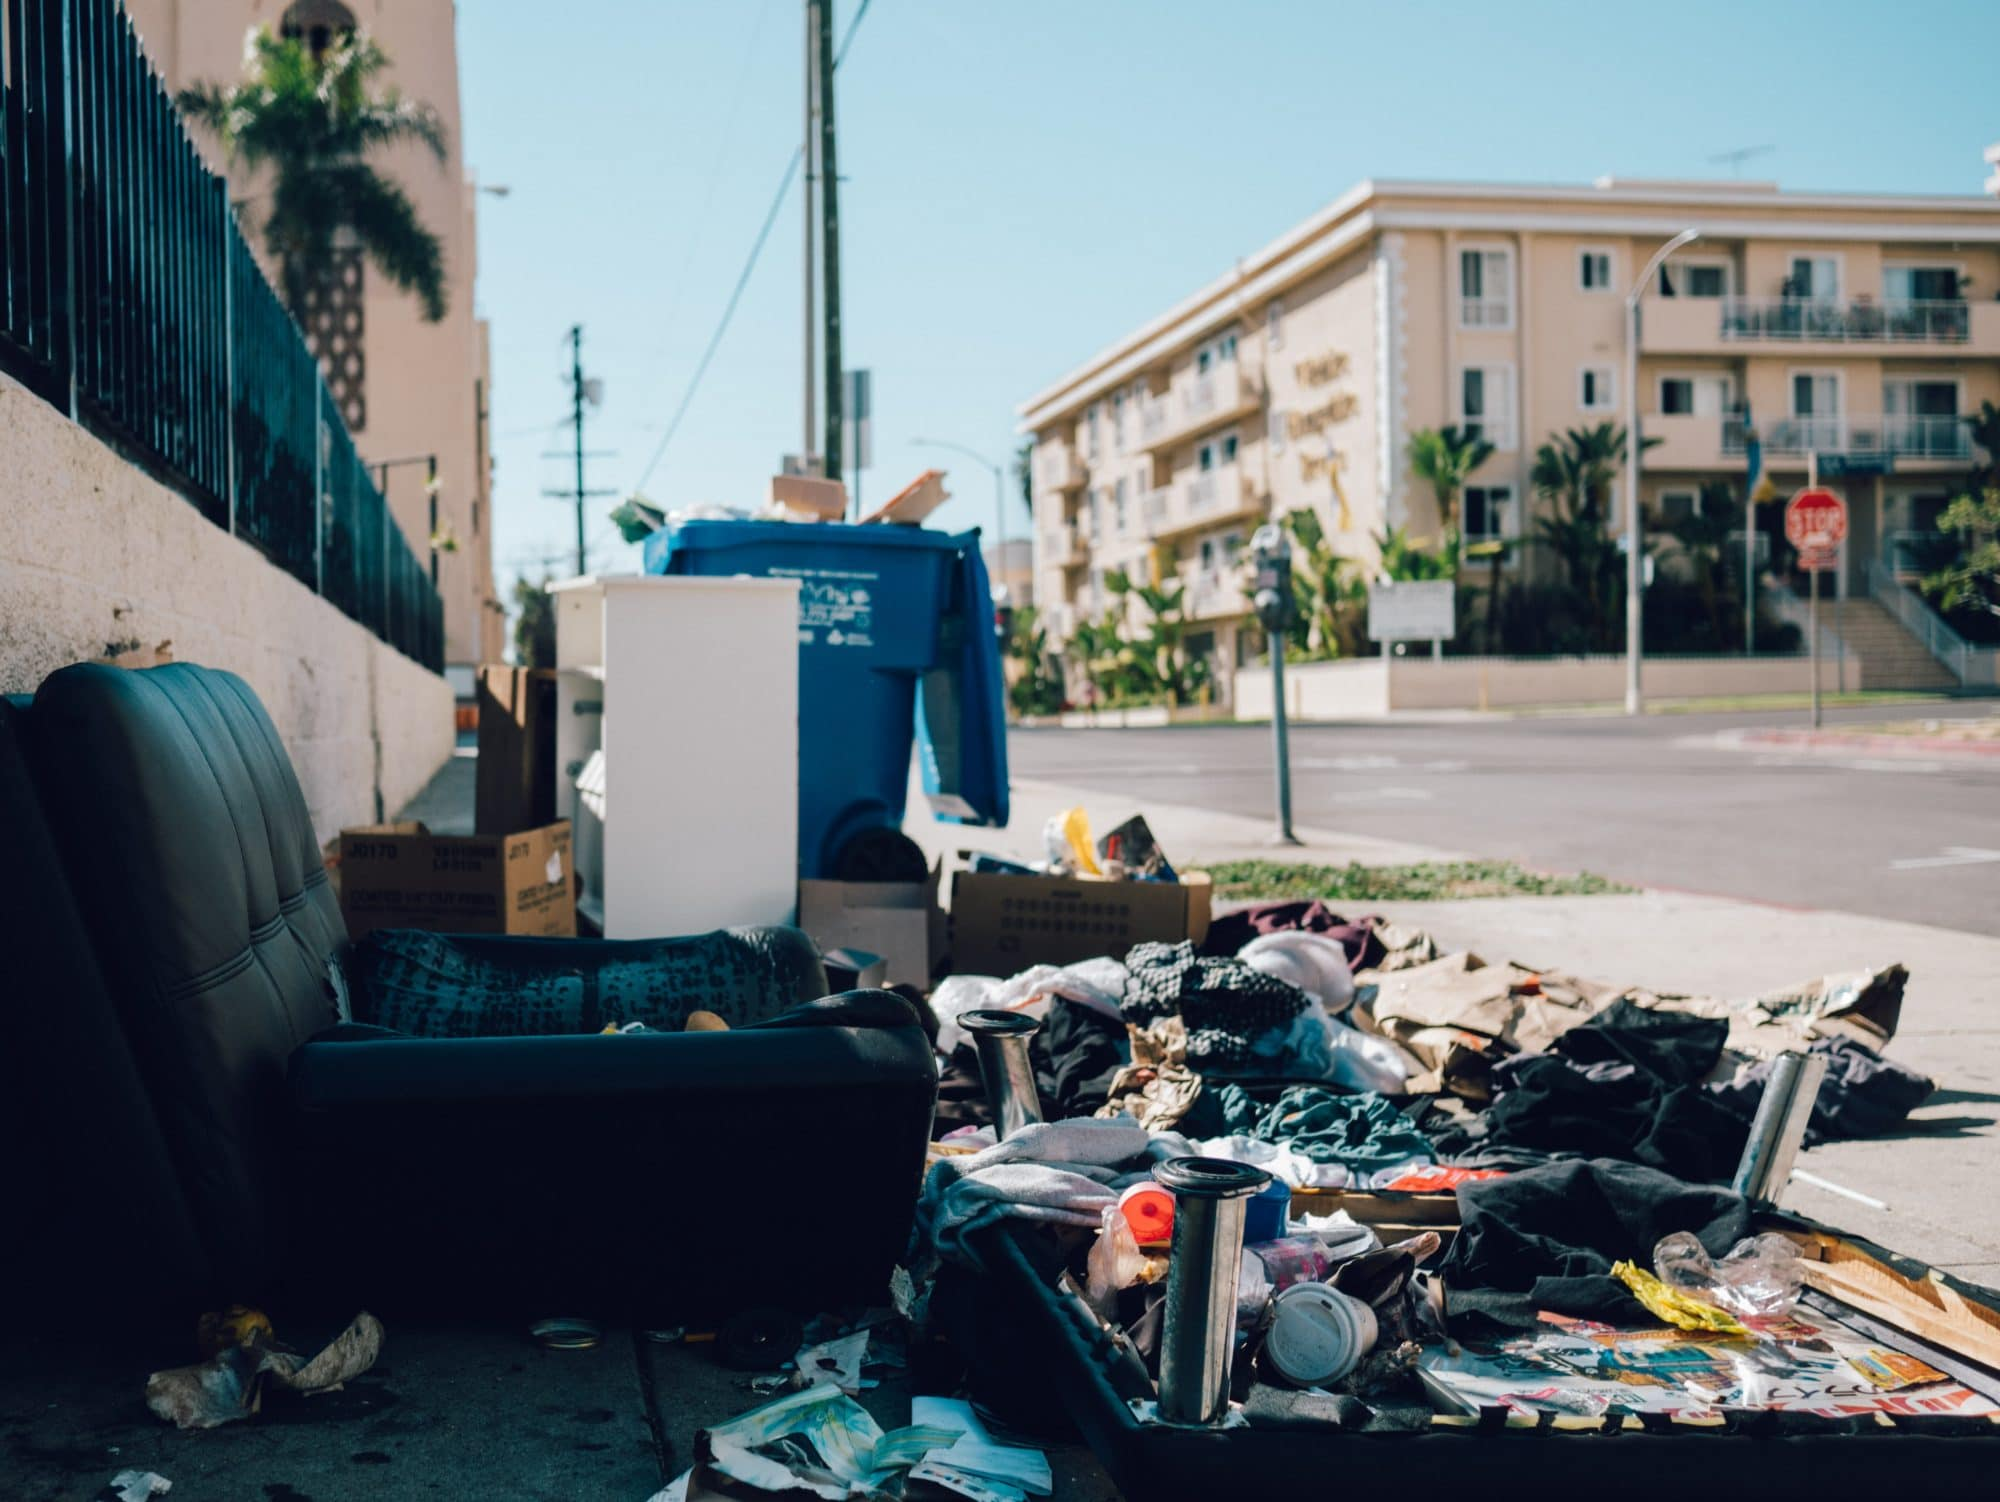 Garbage in California